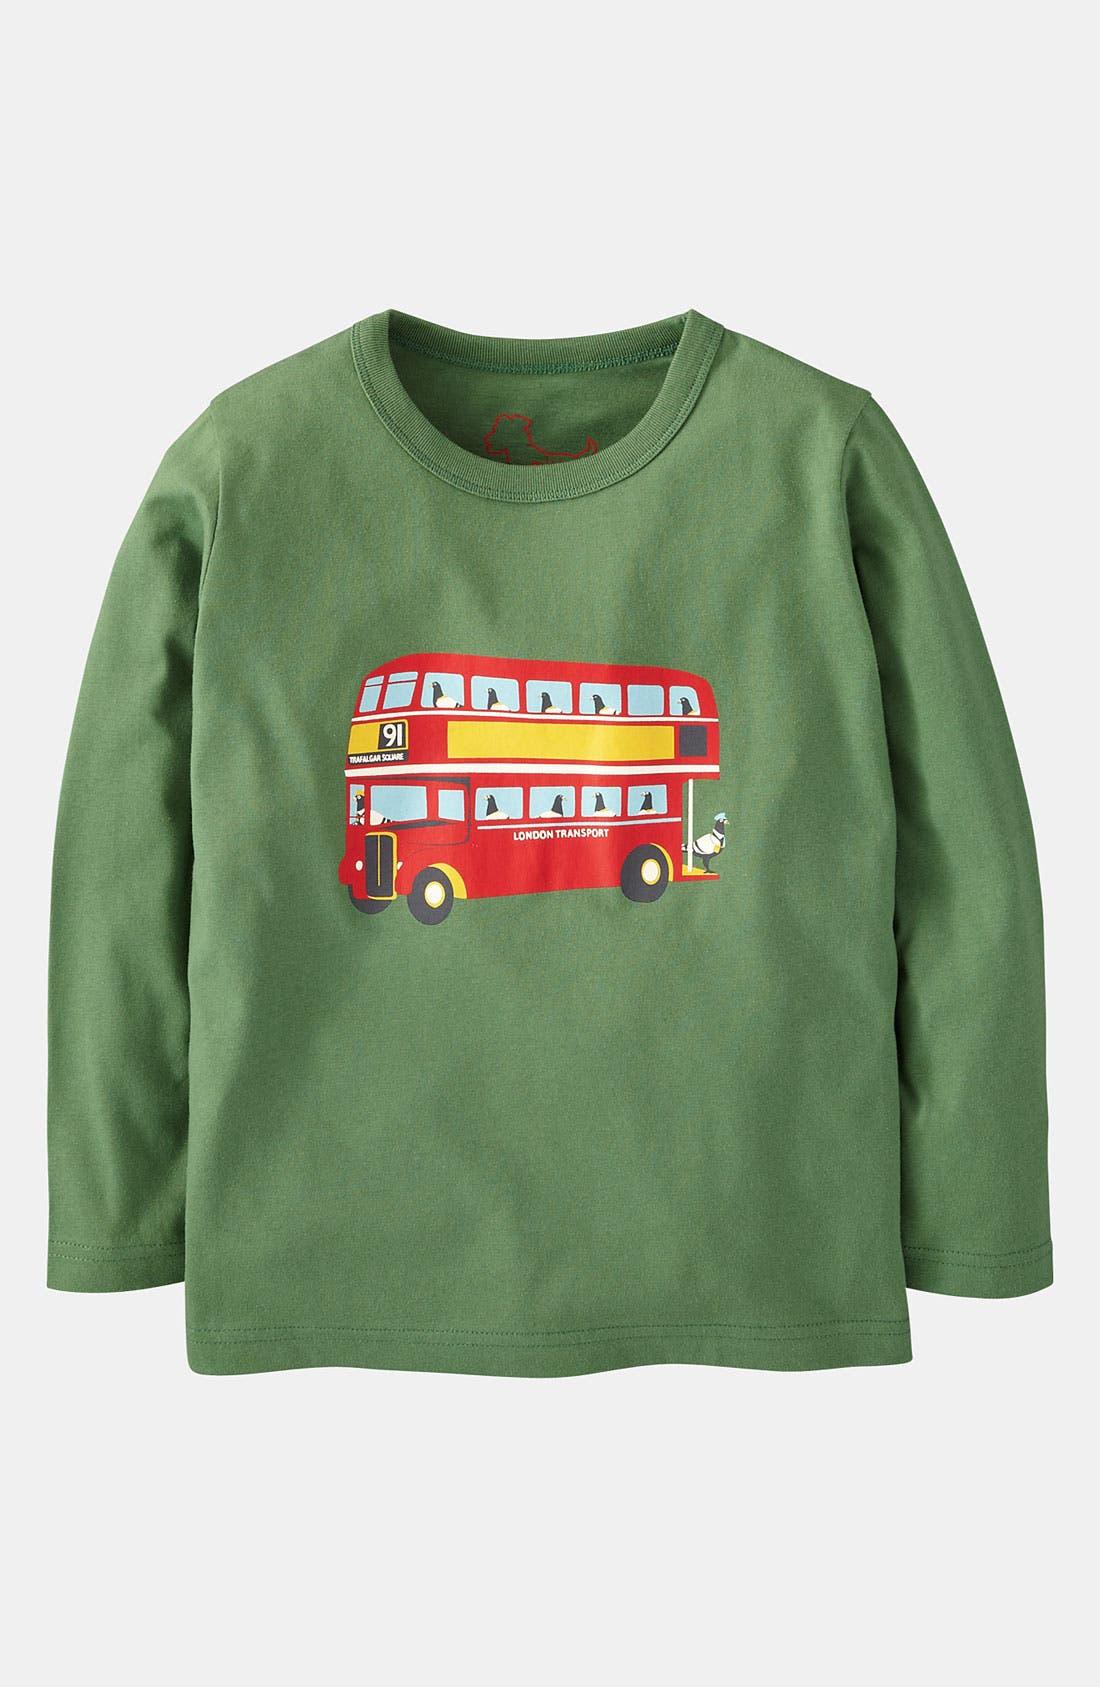 Main Image - Mini Boden 'London' T-Shirt (Toddler)